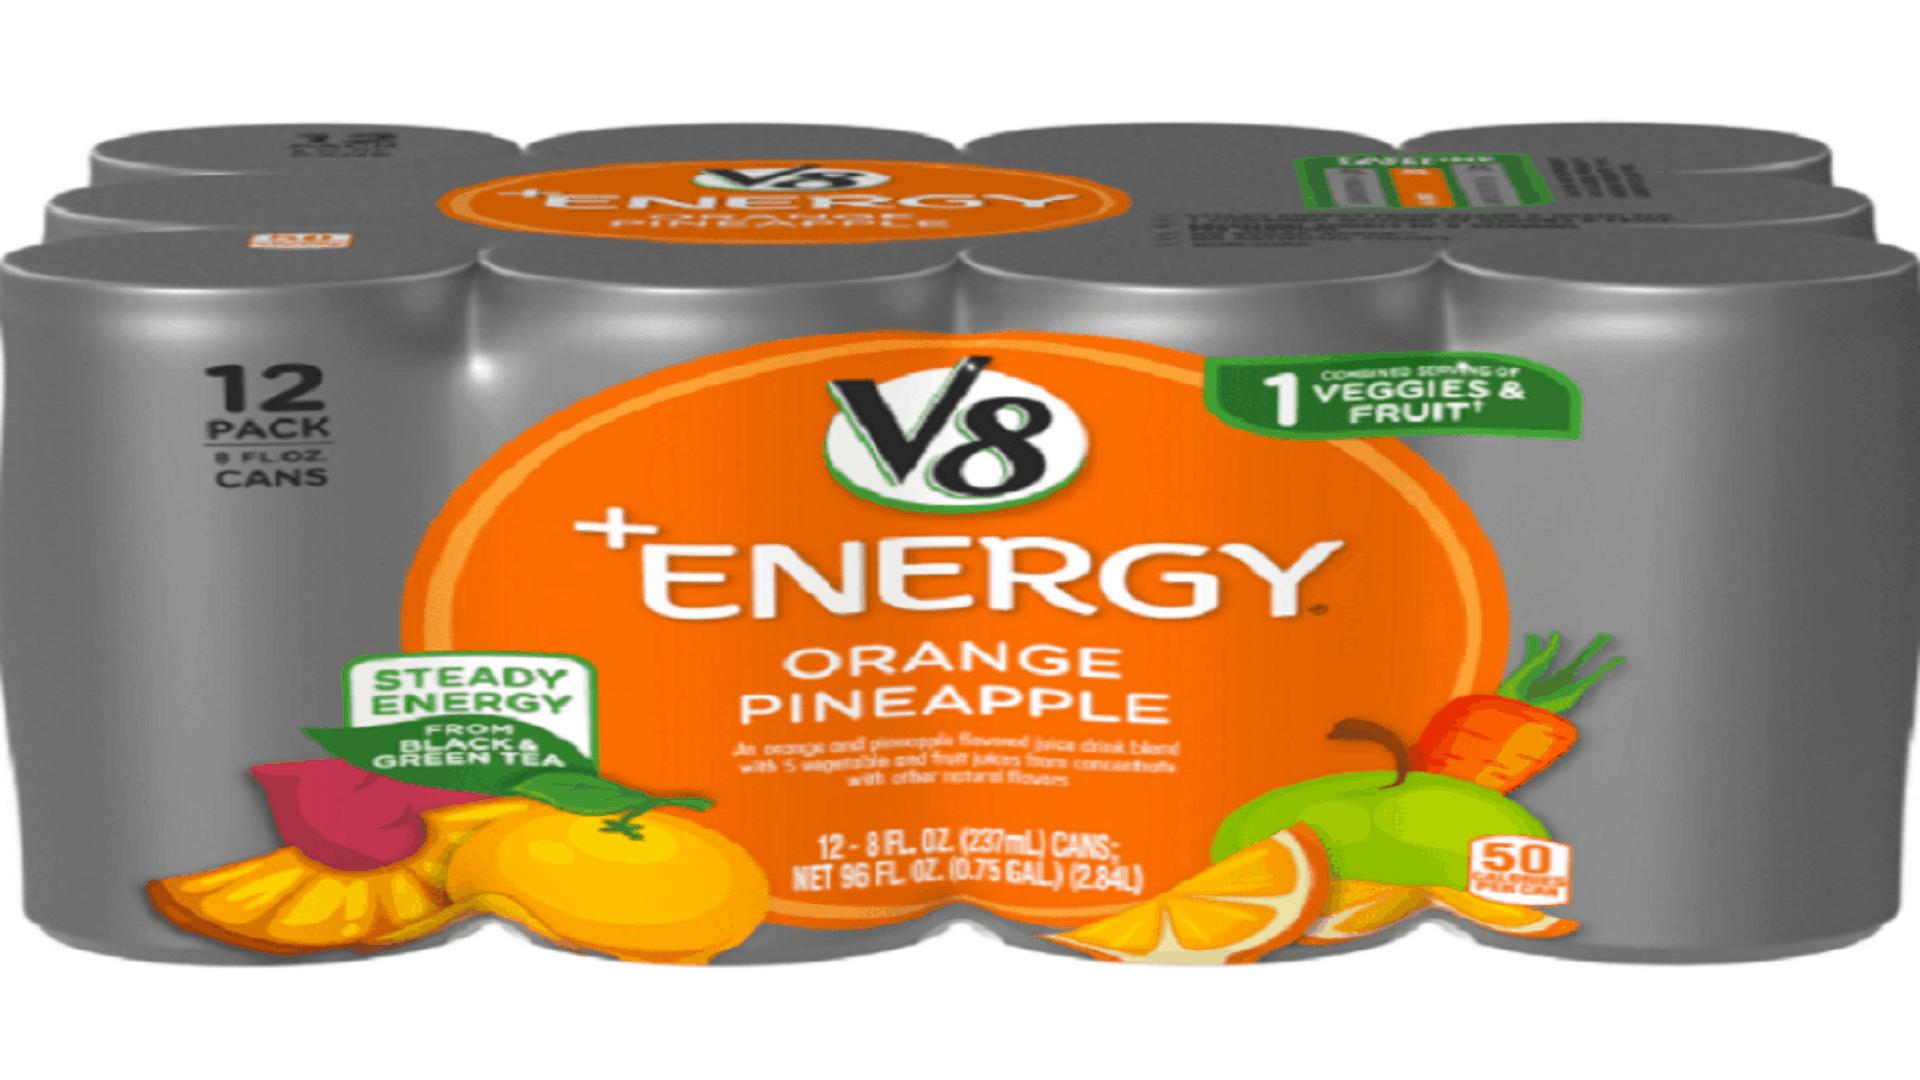 v8 energy drink